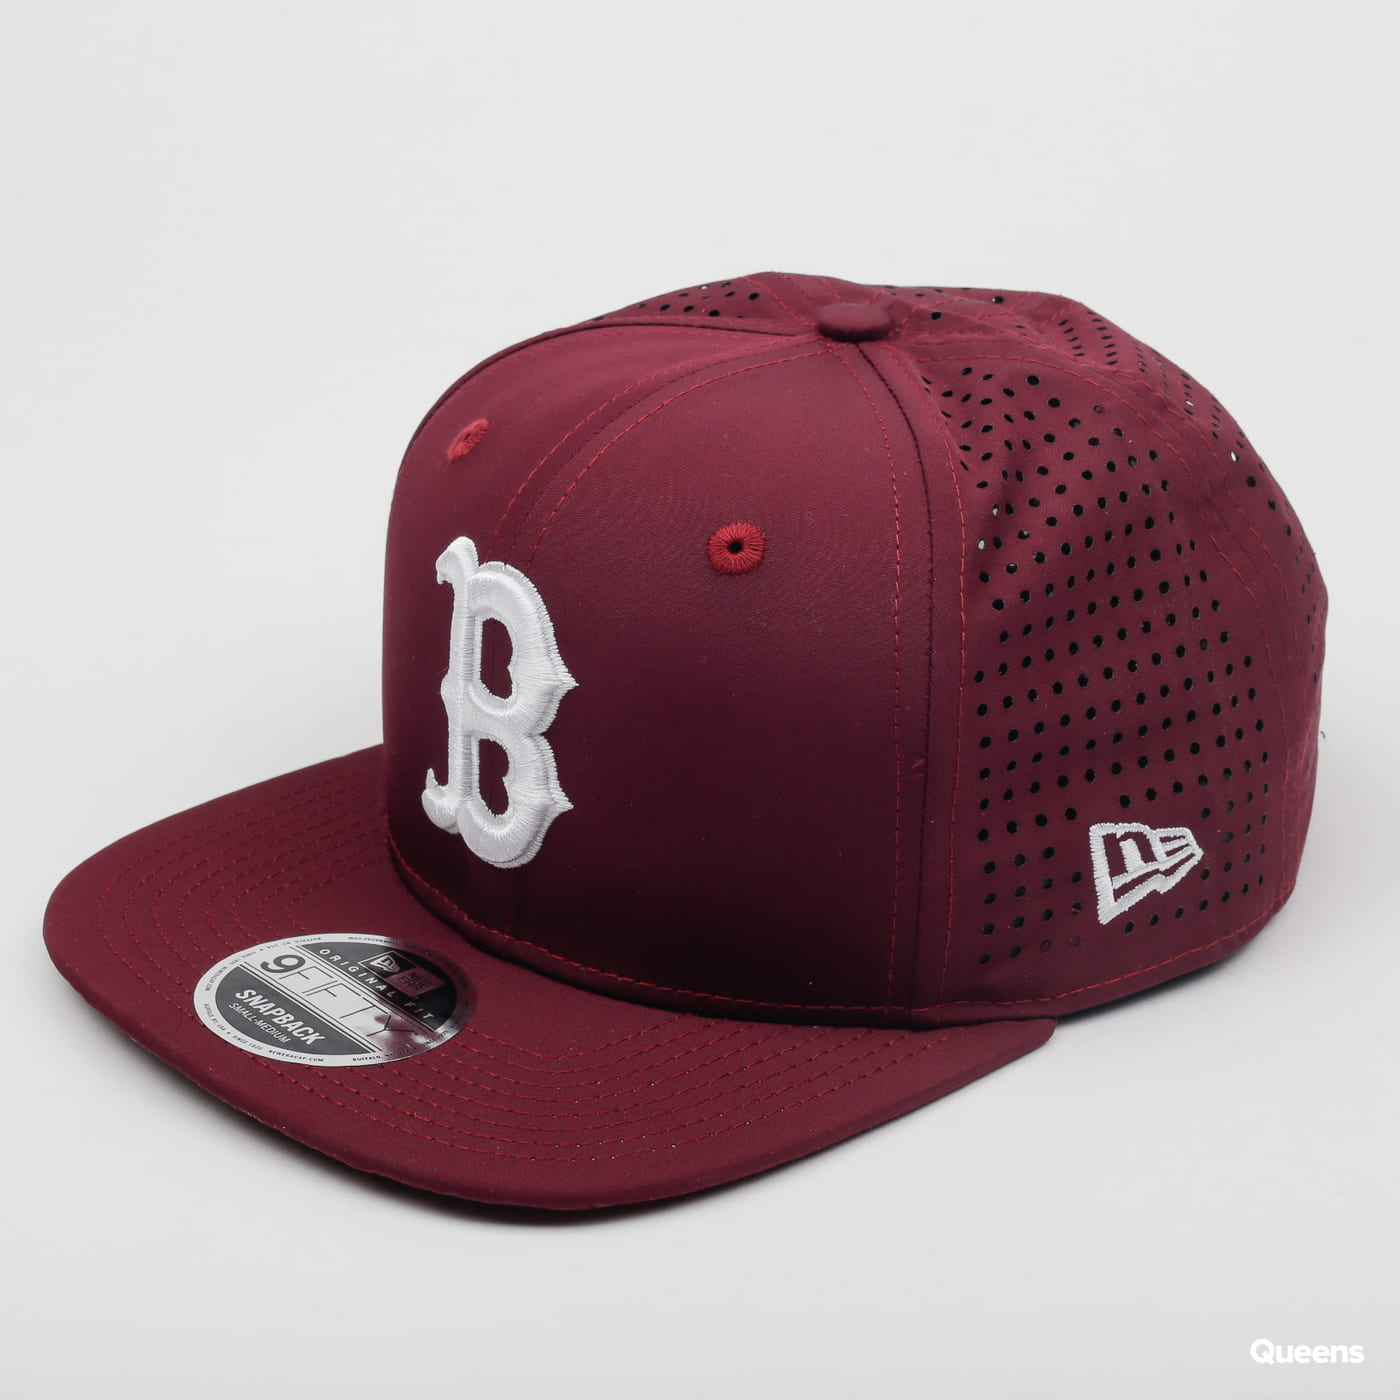 New Era 950 Original Fit MLB B dunkles weinrot